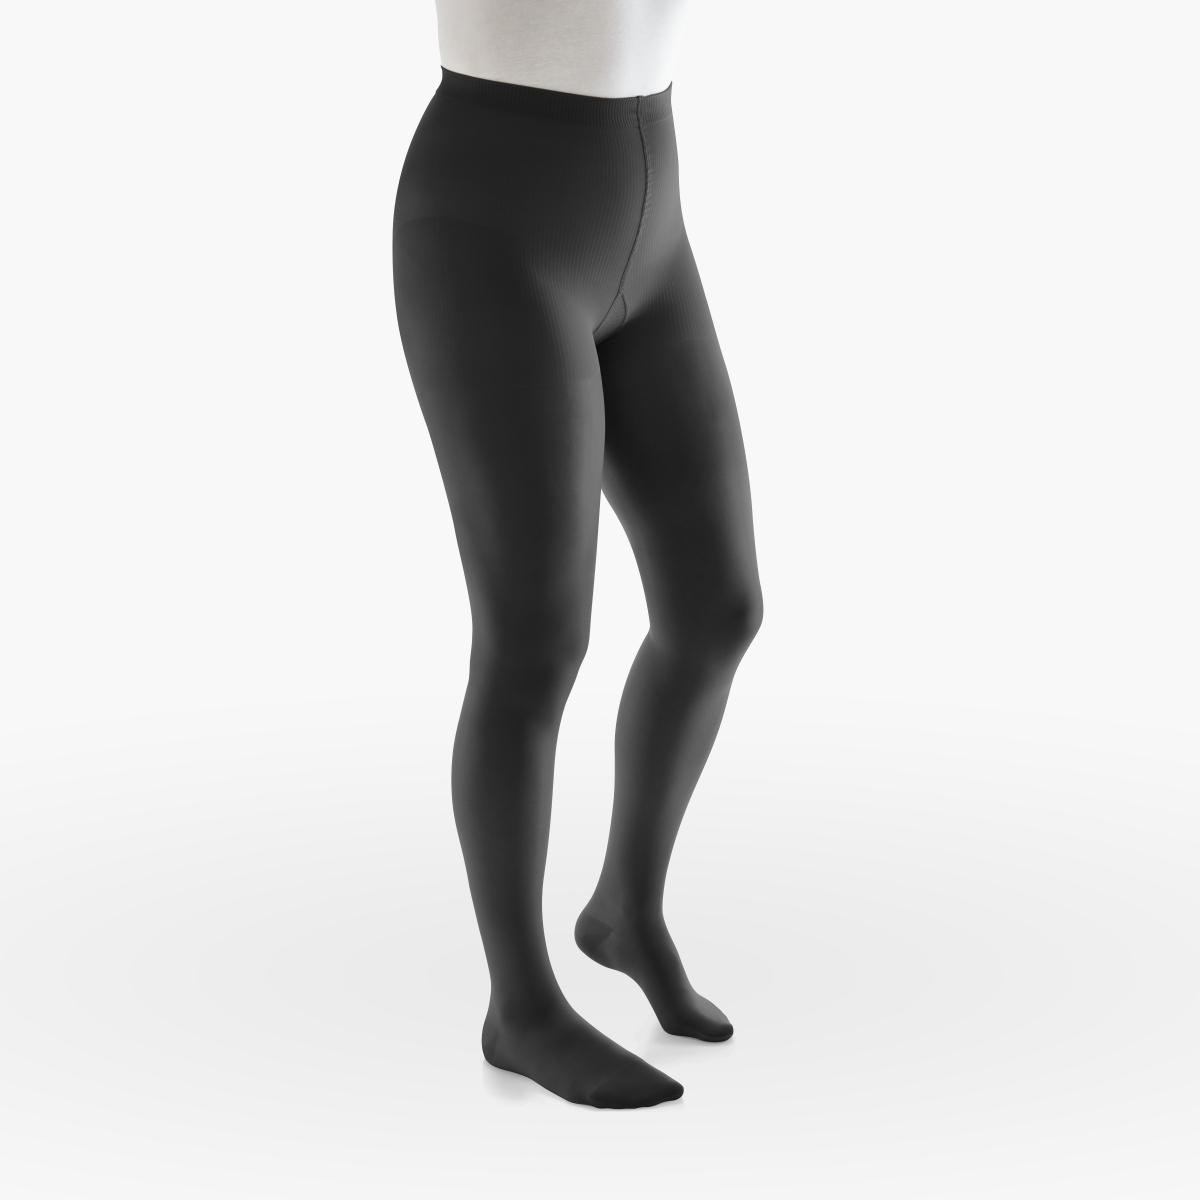 VENOSAN Sheer Secrets, Pantyhose 15-20, Classic black, S, Closed Toe Moderate 15-20 mmHg | Classic black | S |  | Closed Toe | Knit Top